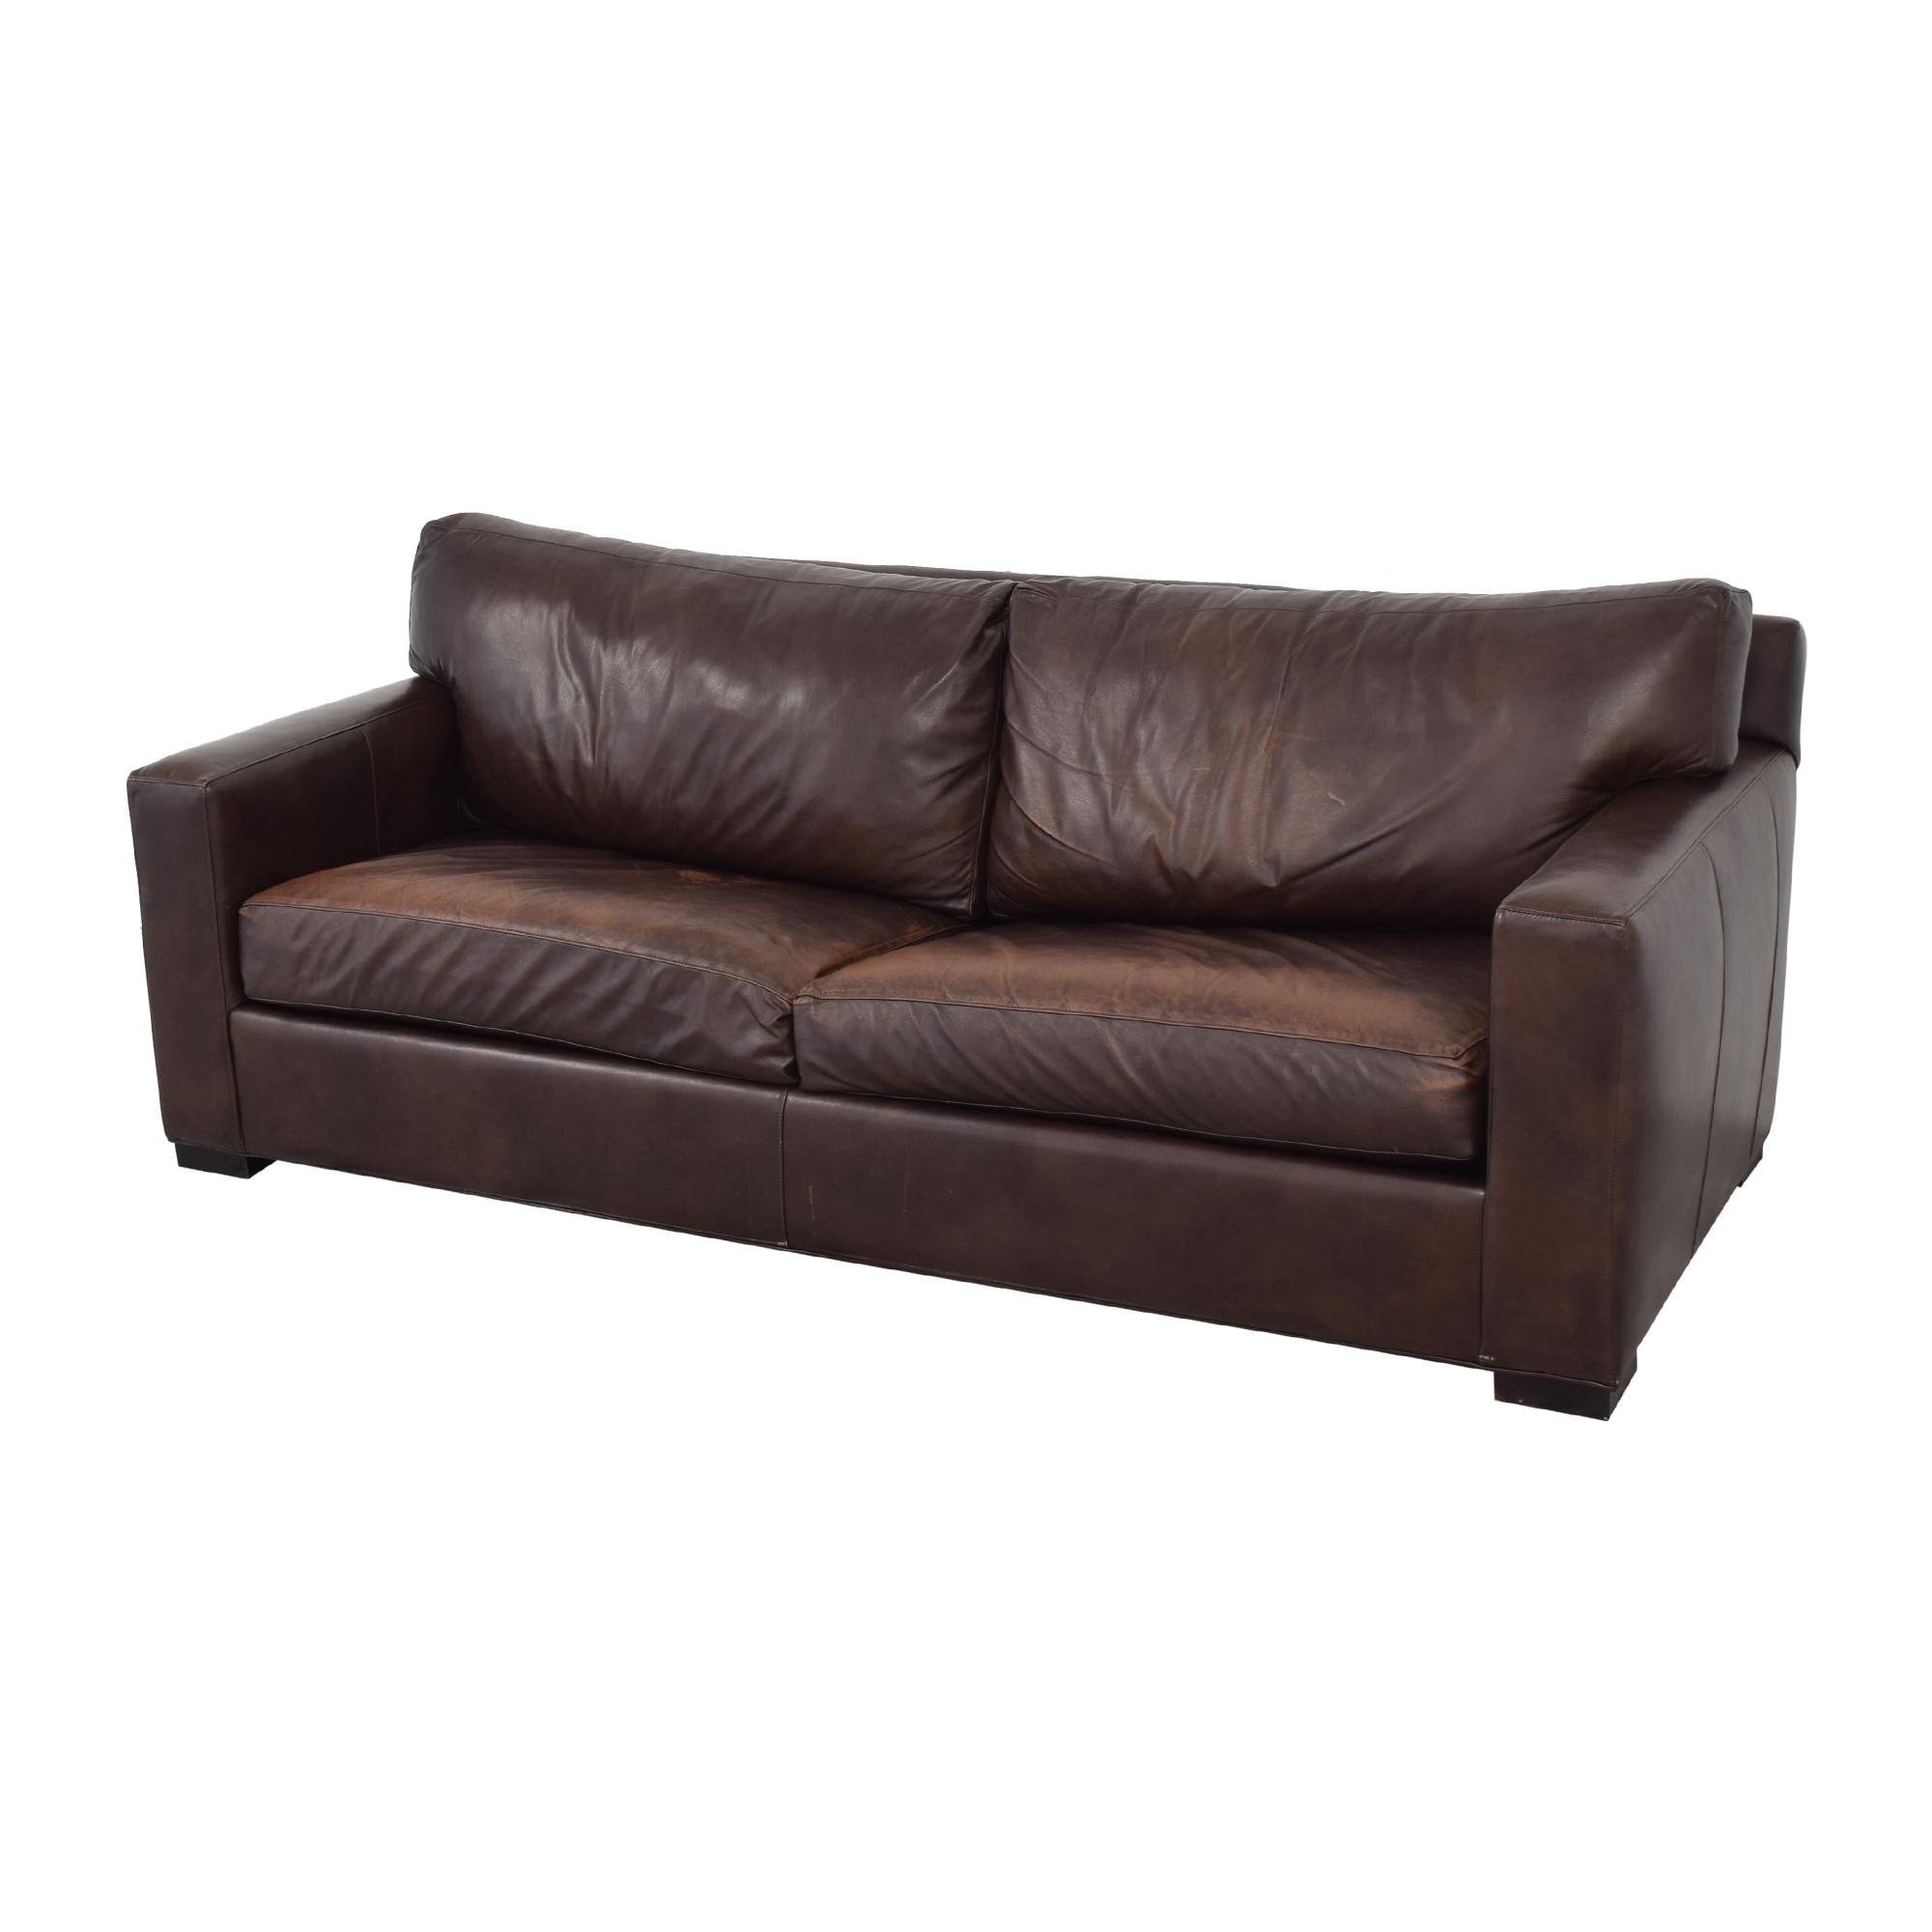 buy Crate & Barrel Axis II Leather Two Seat Queen Sleeper Sofa Crate & Barrel